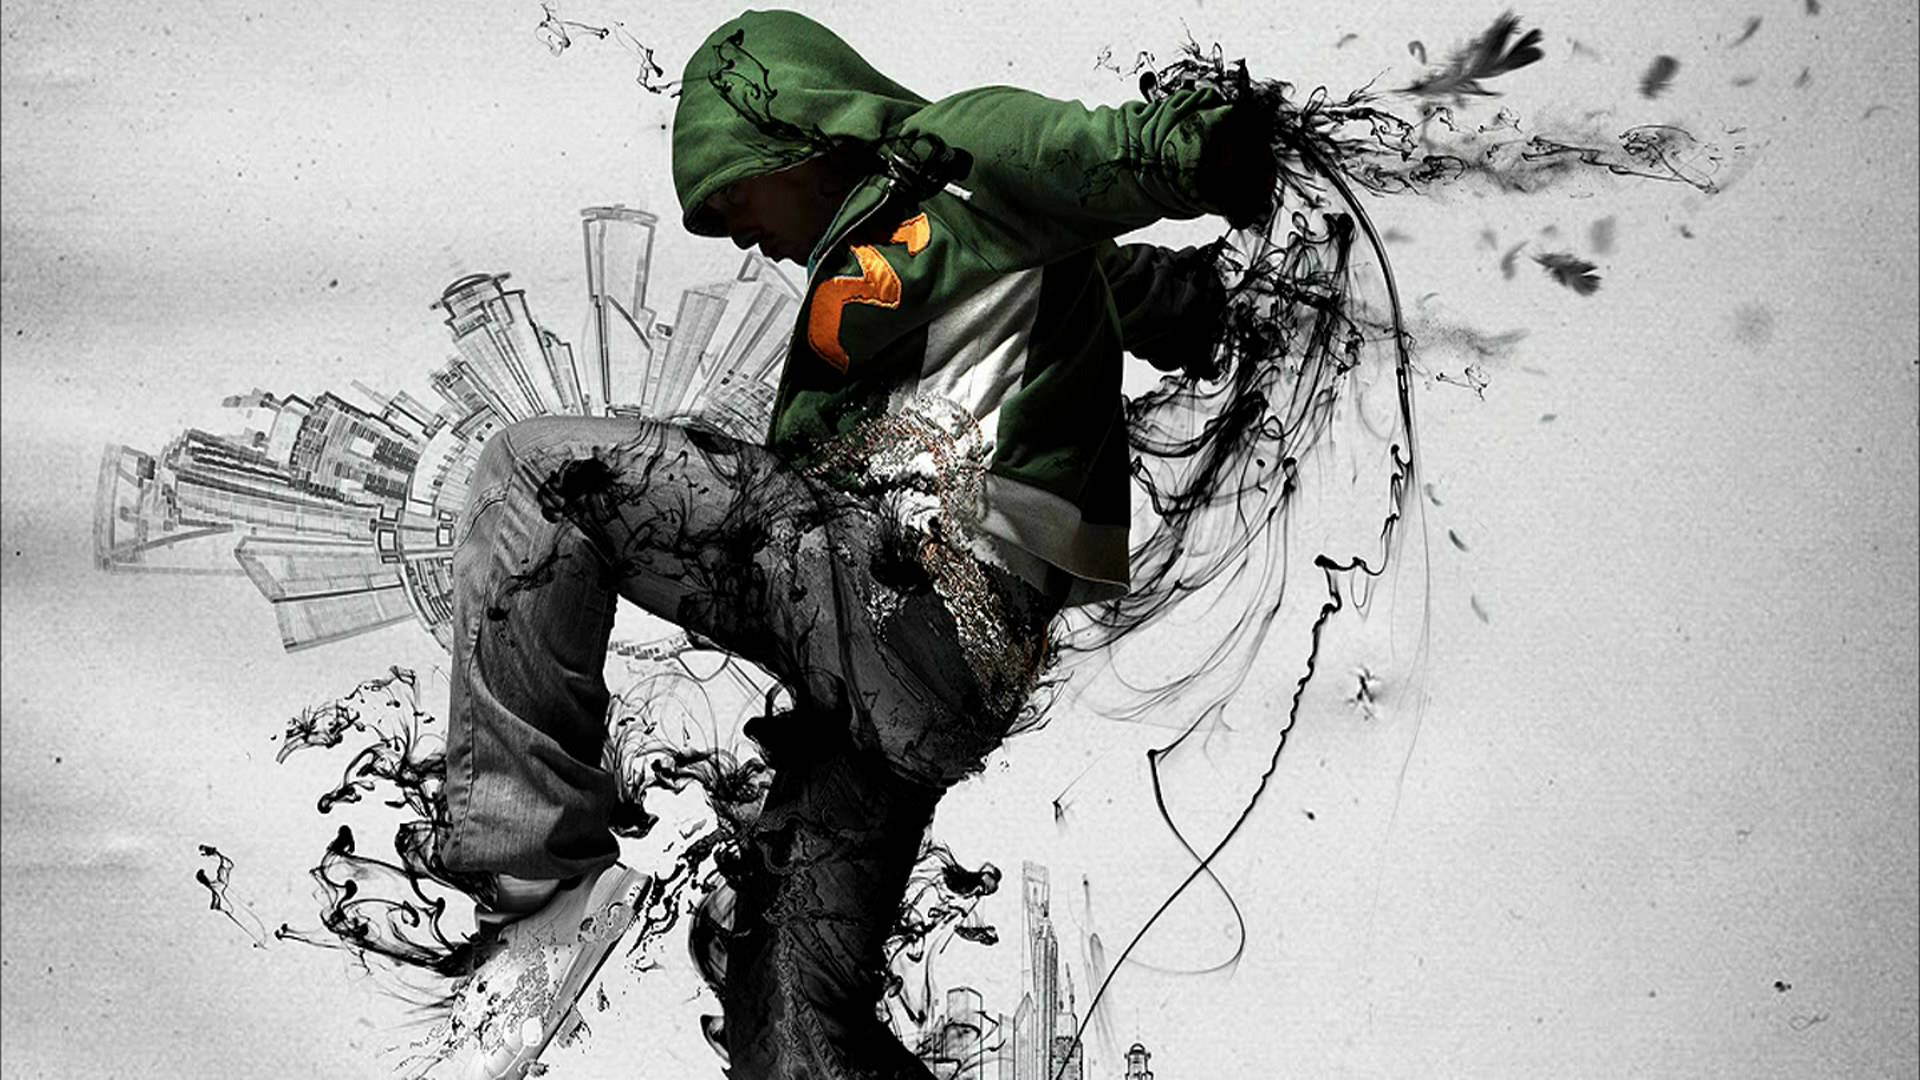 Exorcist Hip Hop Remix [CRG] - YouTube